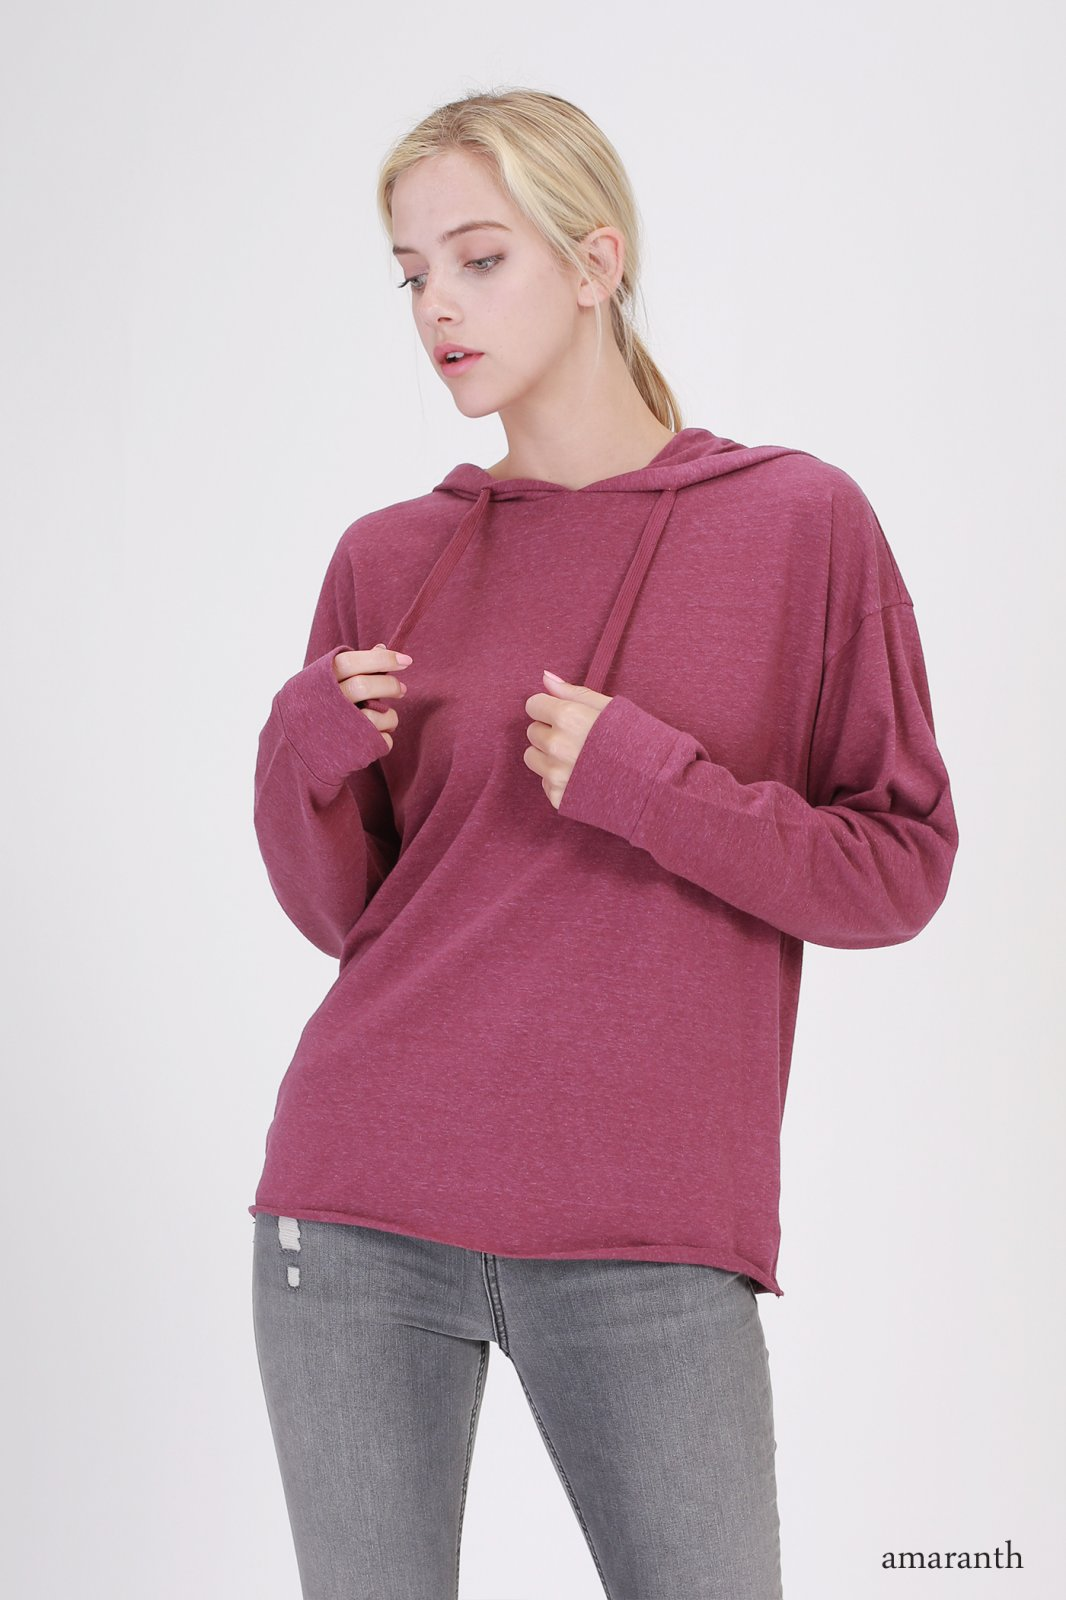 Hooded Top - Long Sleeve AMARANTH